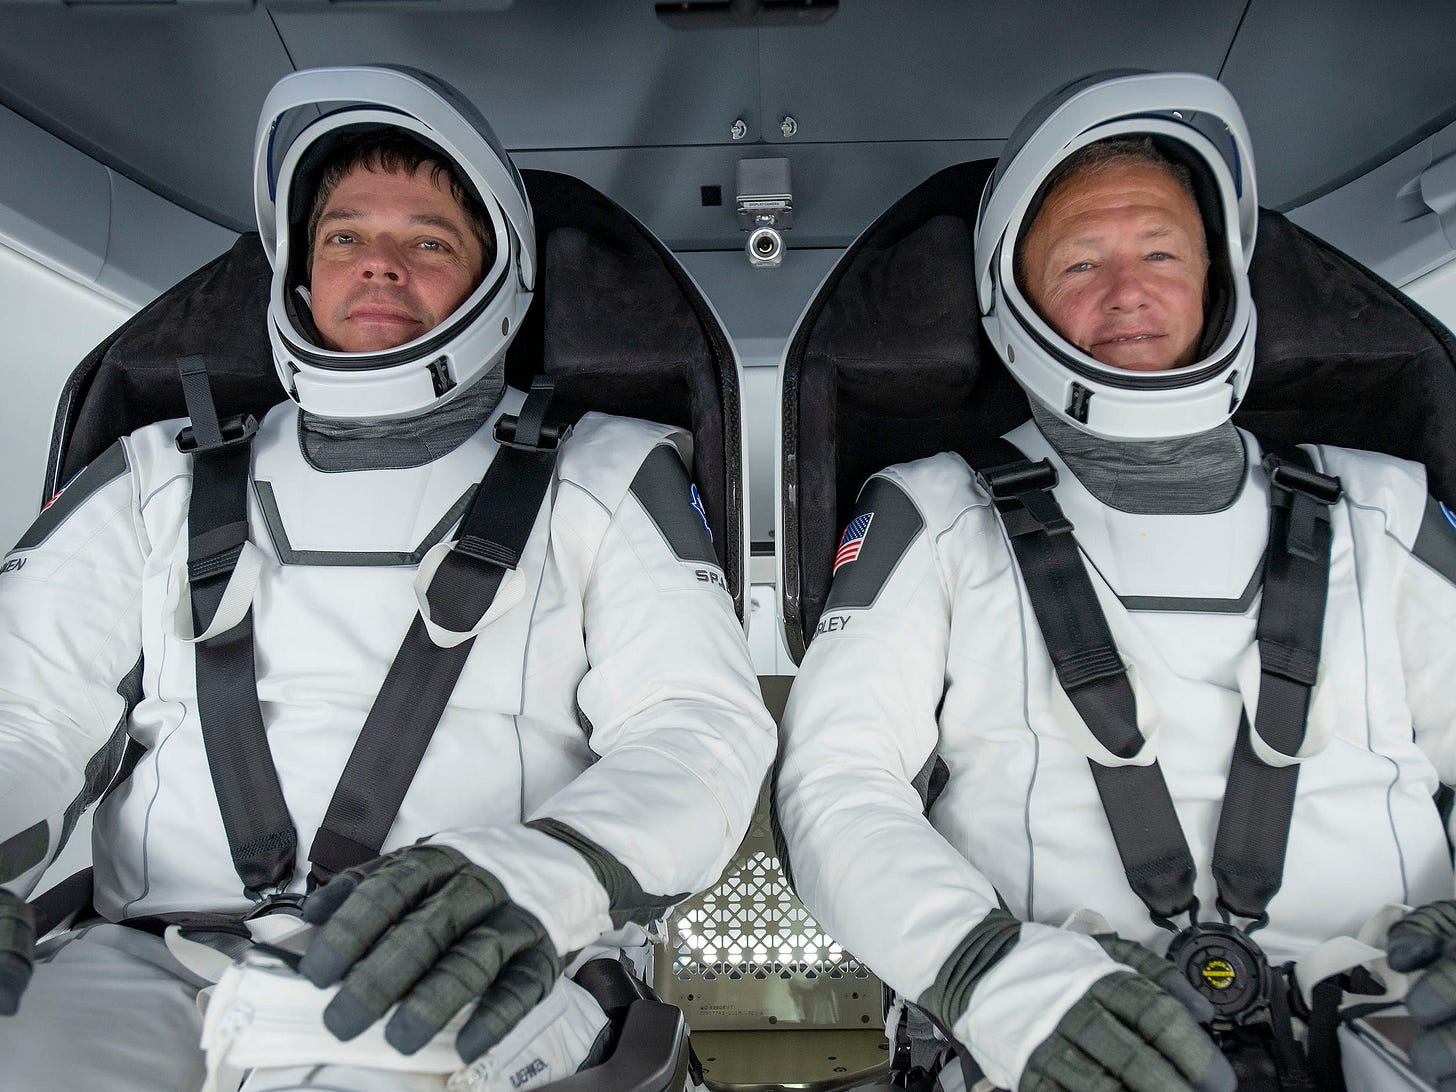 nasa astronauts bob behnken doug hurley spacex spacesuits crew dragon spaceship seats training demo2 demo 2